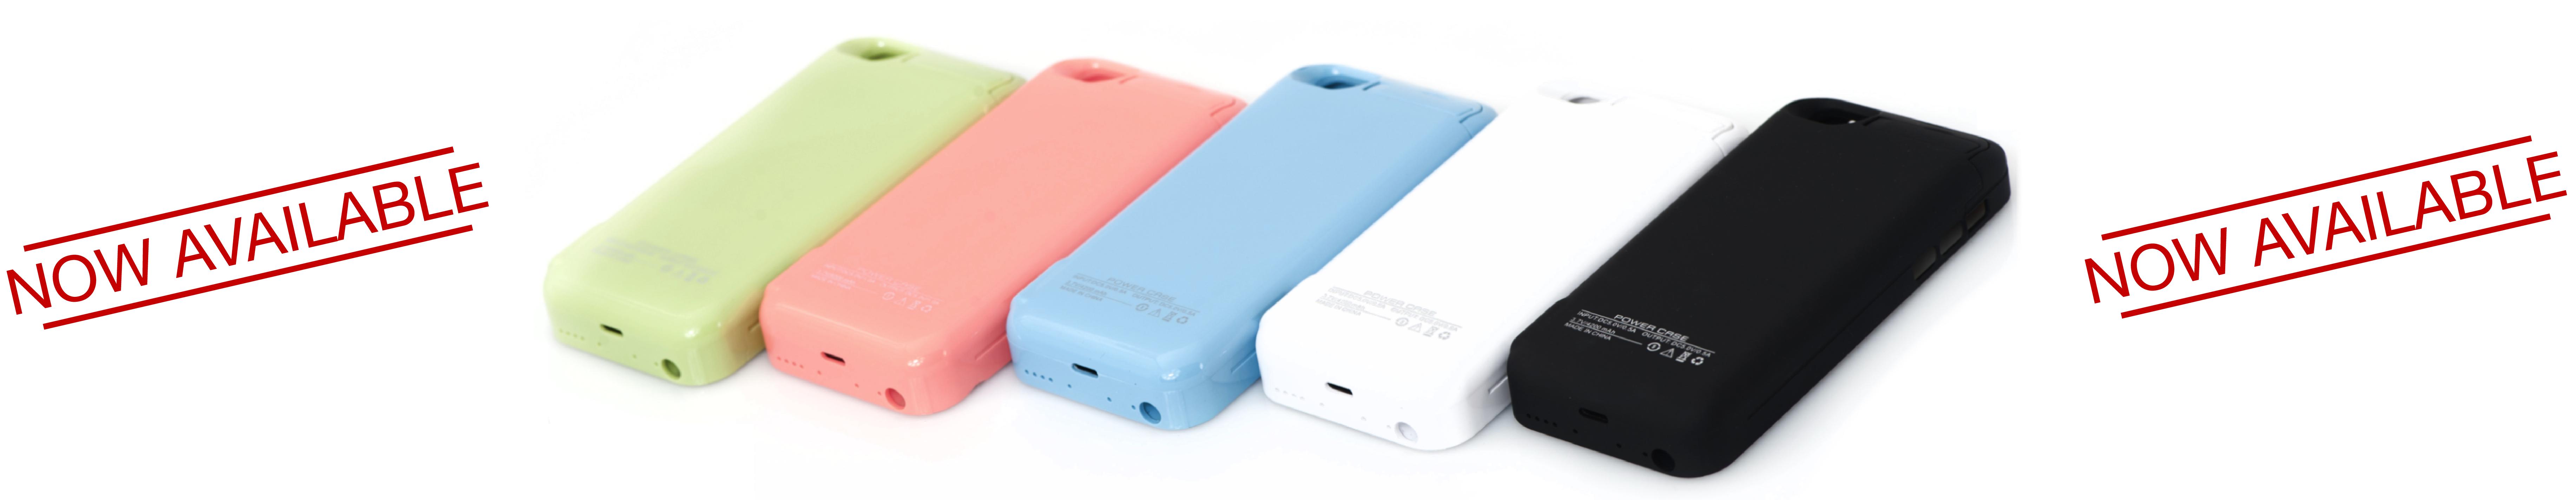 Gotek7 Iphone case